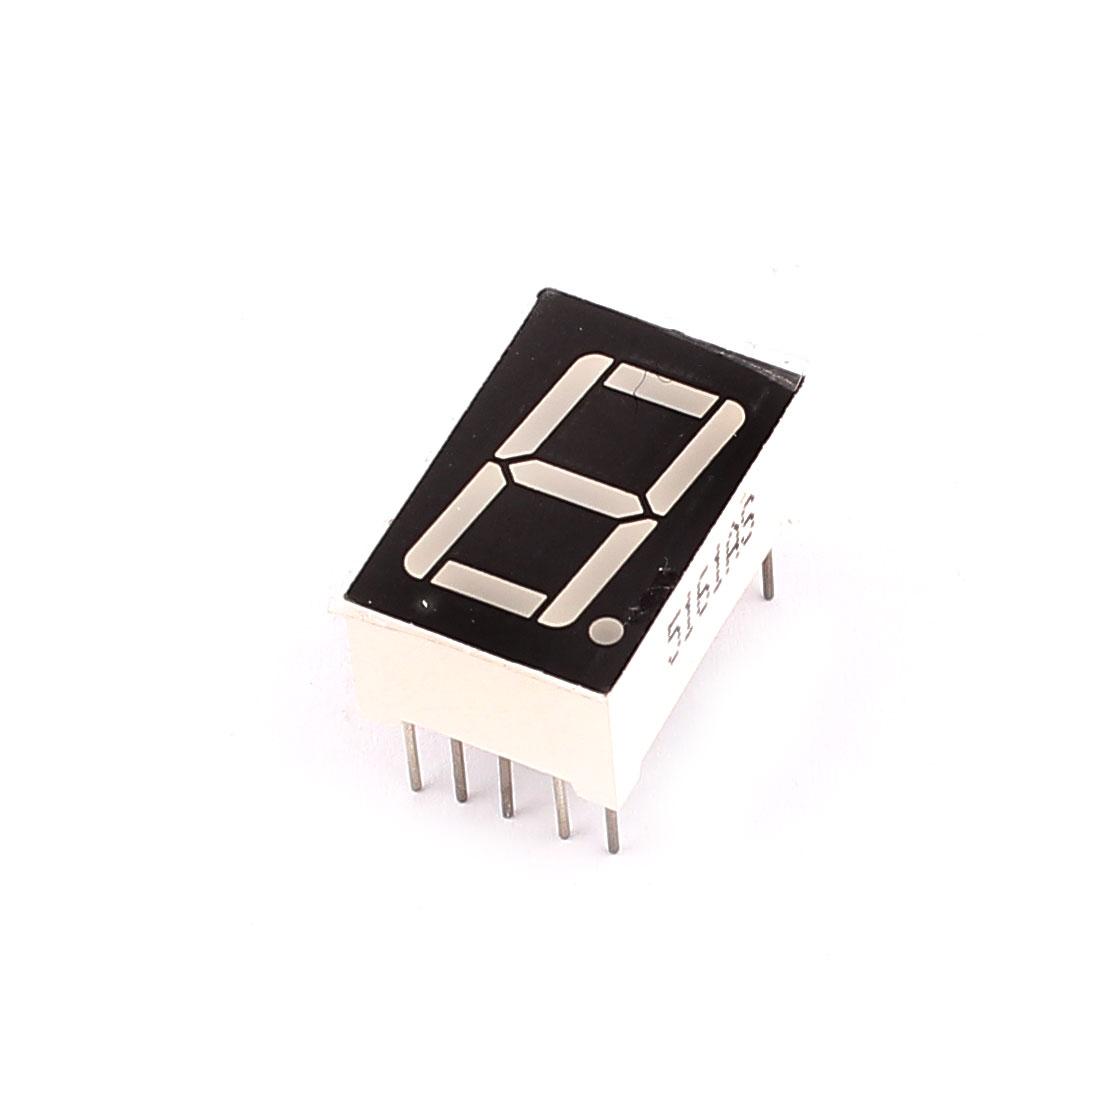 "Common Cathode 10 Pin 1 Bit 7 Segment 0.56"" Red LED Display Digital Tube"